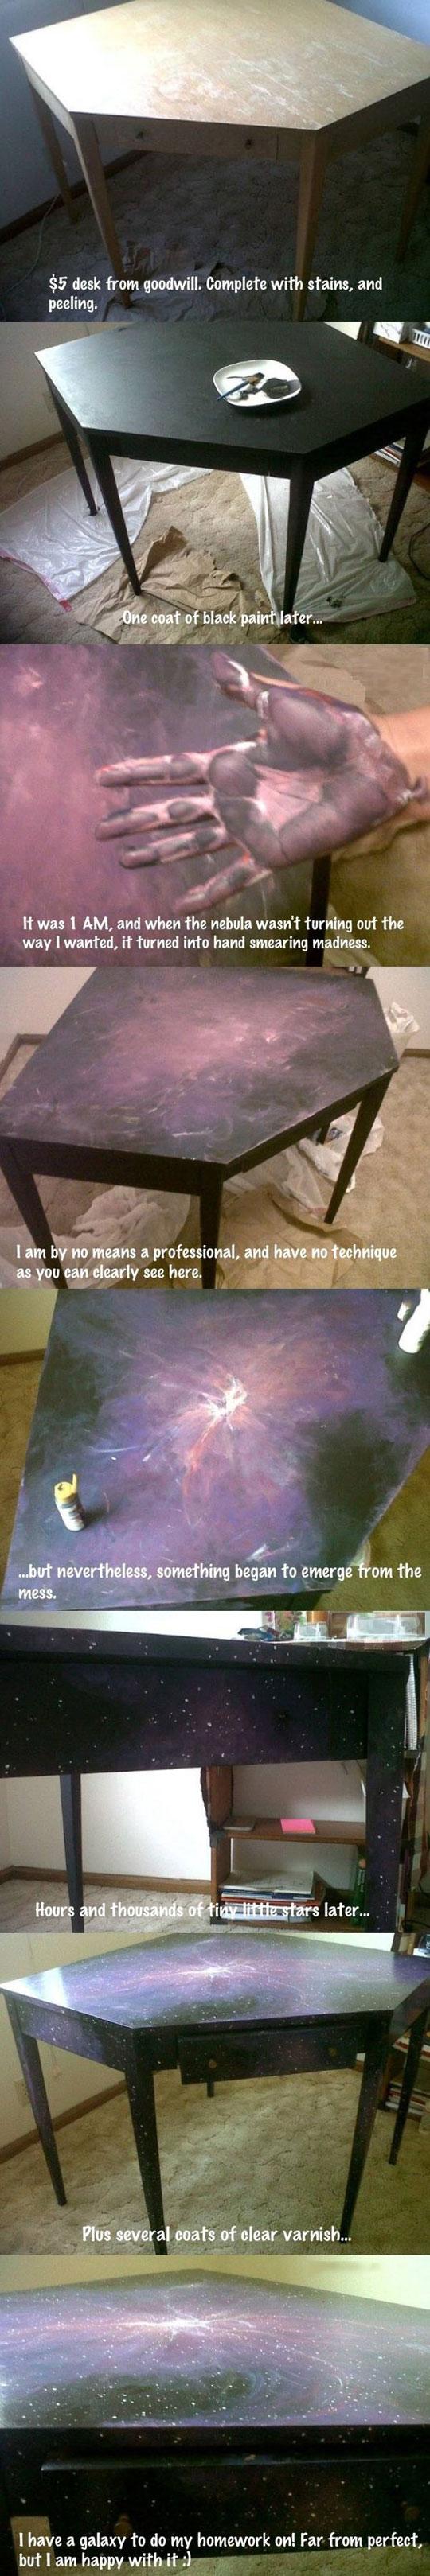 cool-galaxy-table-paint-job